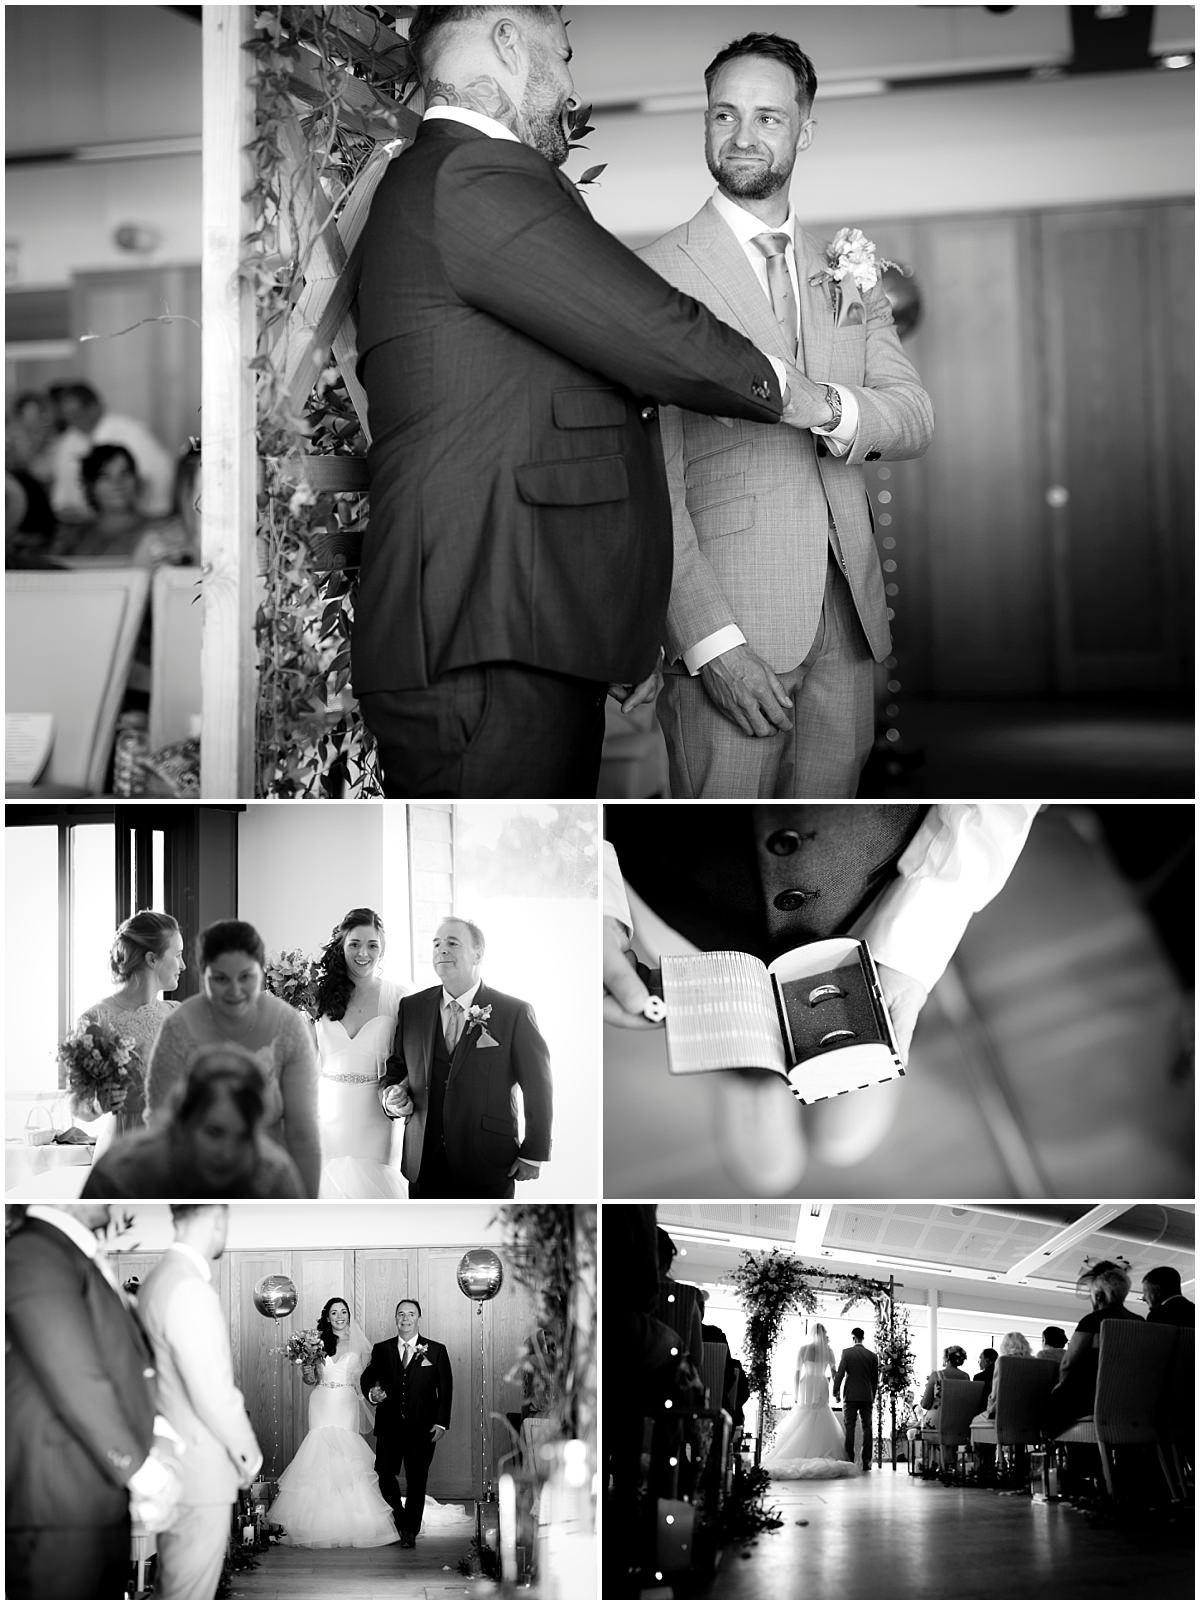 Twycross Zoo Wedding ceremony 2